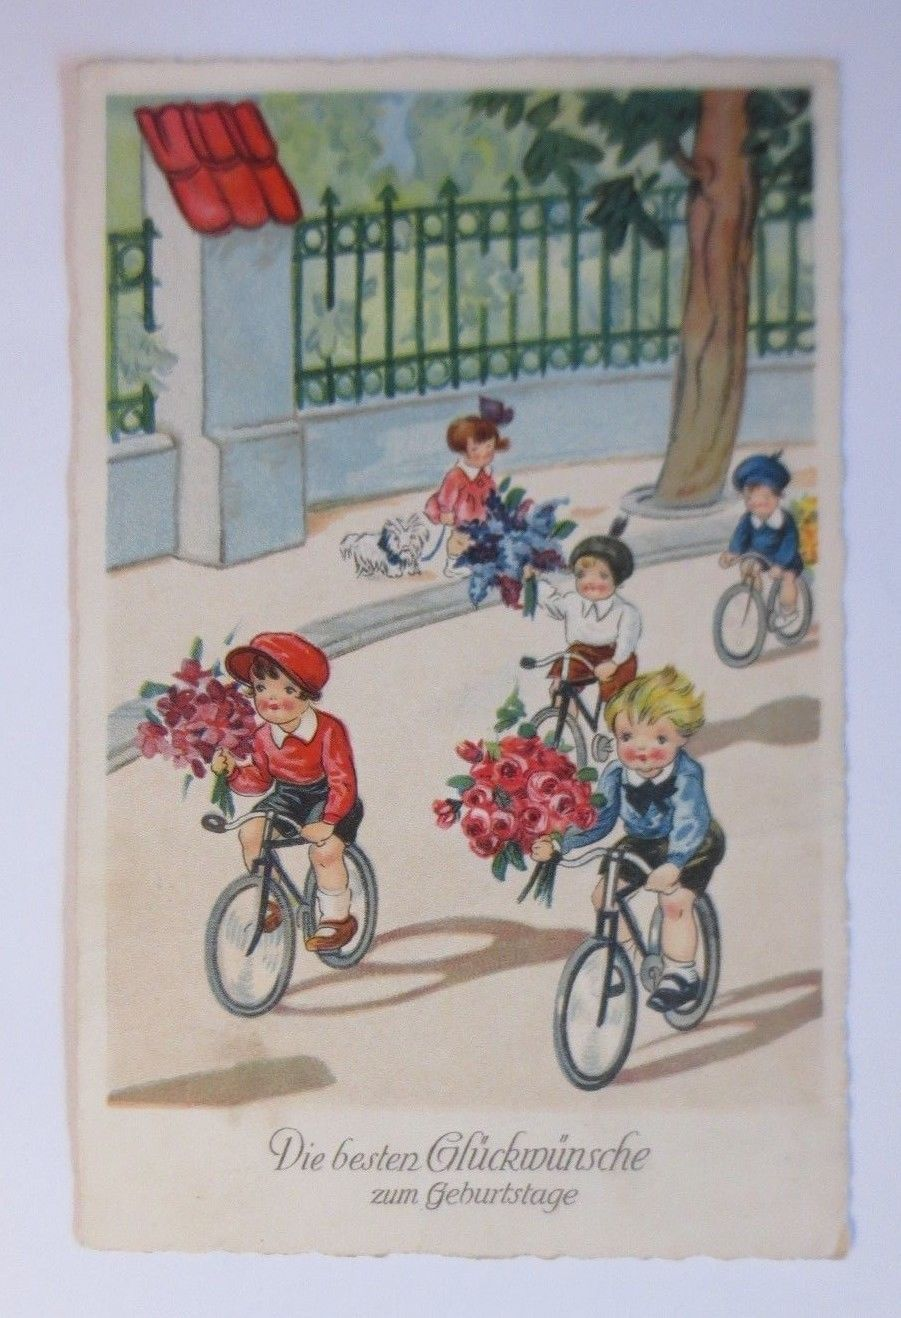 Geburtstag Kinder Fahrrad Blumen 1933 52831 Eur 8 00